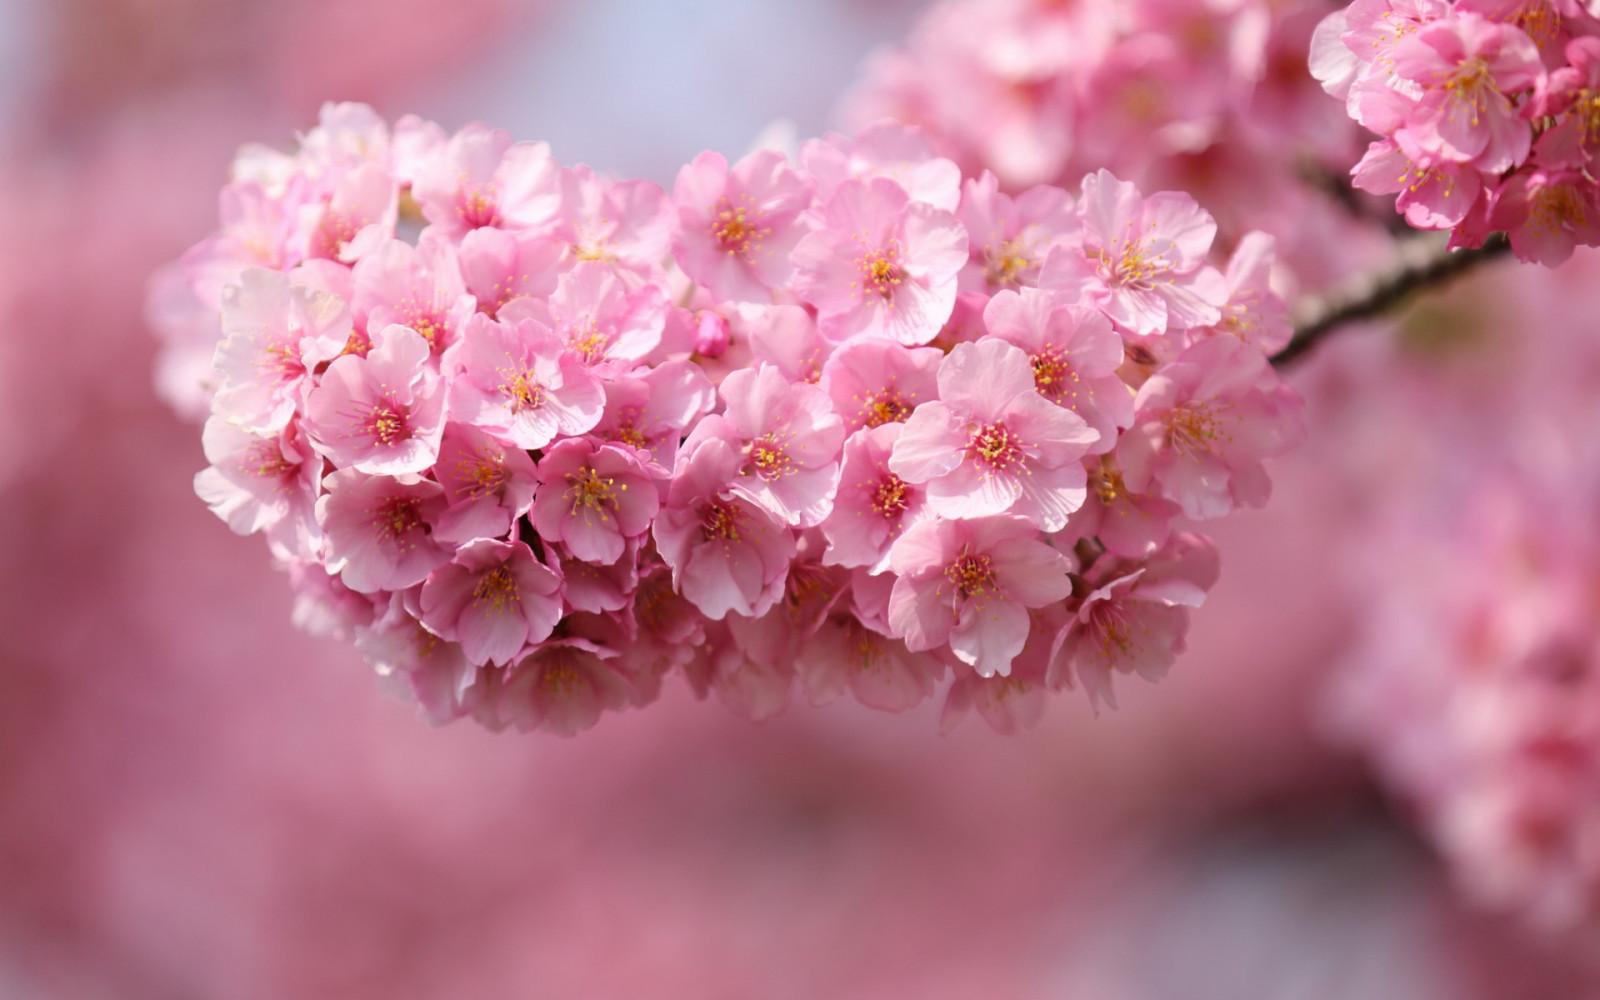 1920x1200 px, blurred, cherry, close, flowers, Japan, macro, petals, pink, sakura, twigs, up, wood